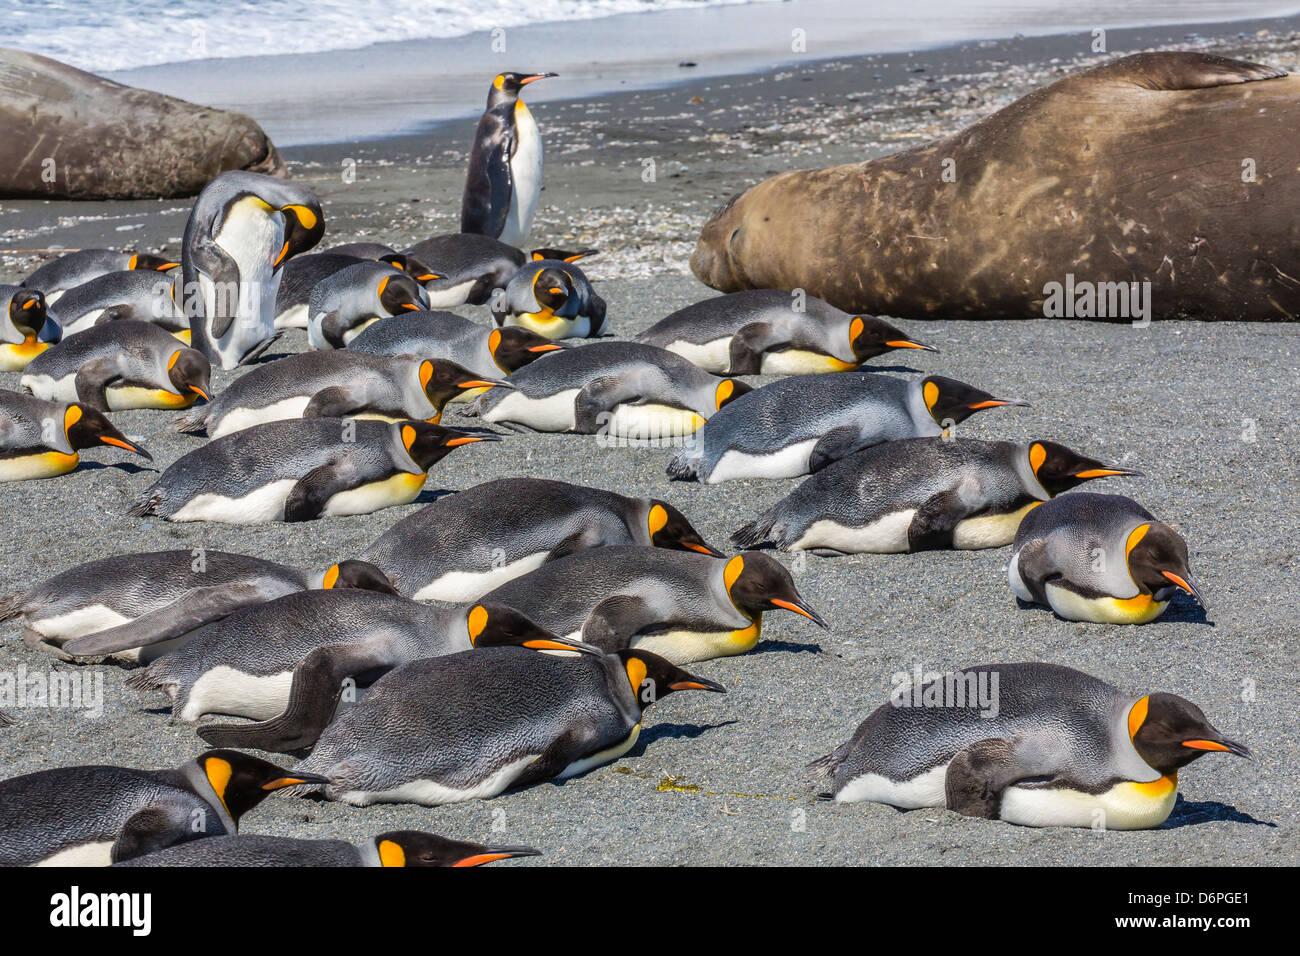 King penguins (Aptenodytes patagonicus), Gold Harbour, South Georgia Island, South Atlantic Ocean, Polar Regions - Stock Image